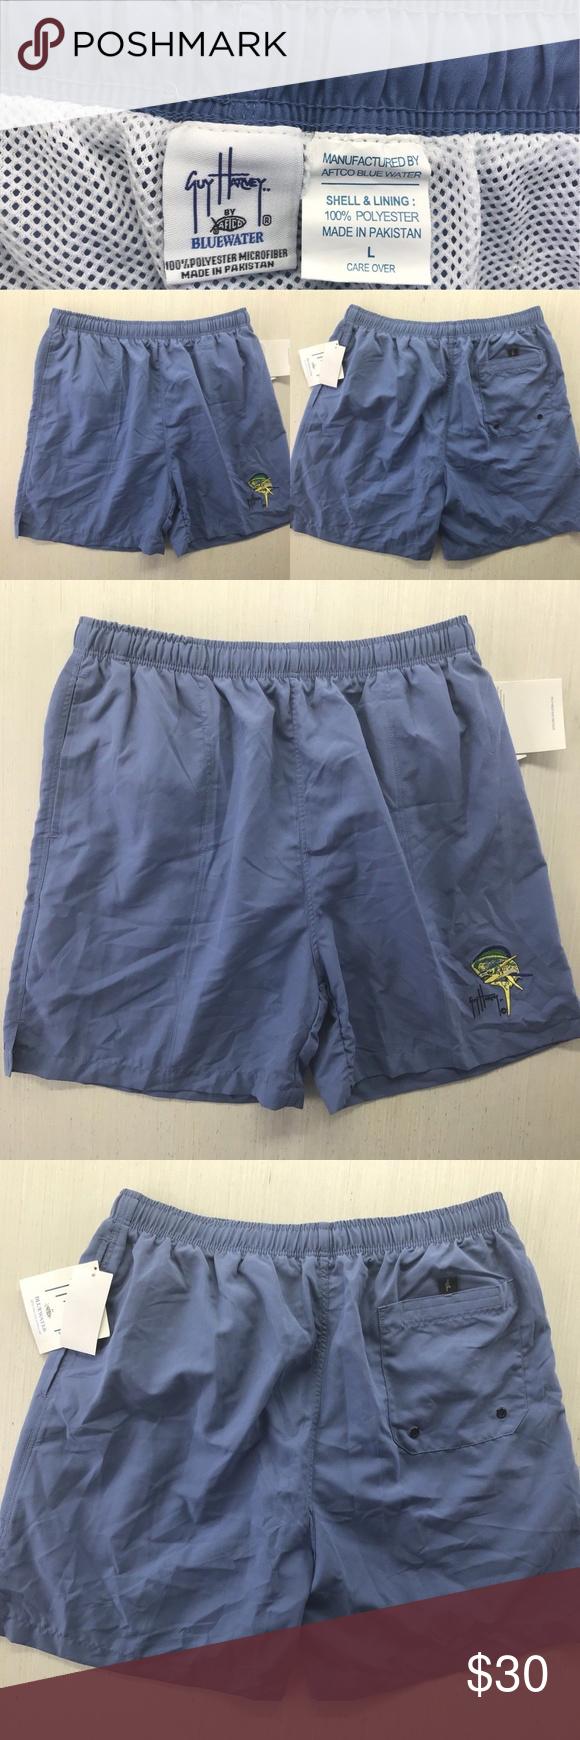 1c25c03c4c Guy Harvey BlueWater swim trunks Mens Size Large Guy Harvey BlueWater swim  trunks Shorts Mens Size